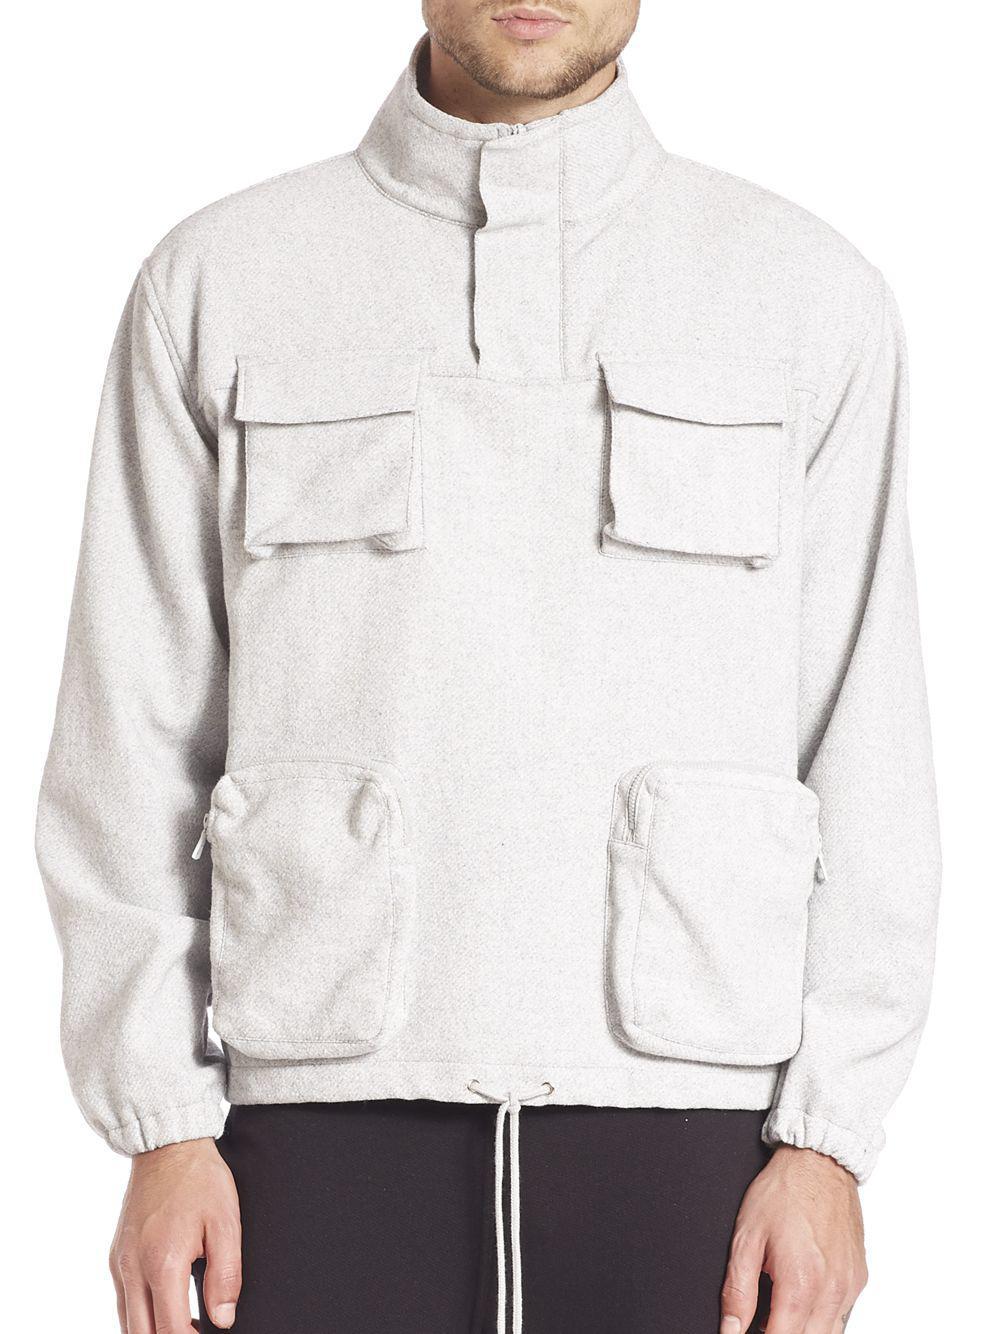 ab1c43861 John Elliott Wool Blend M65 Field Jacket for Men - Save 41% - Lyst